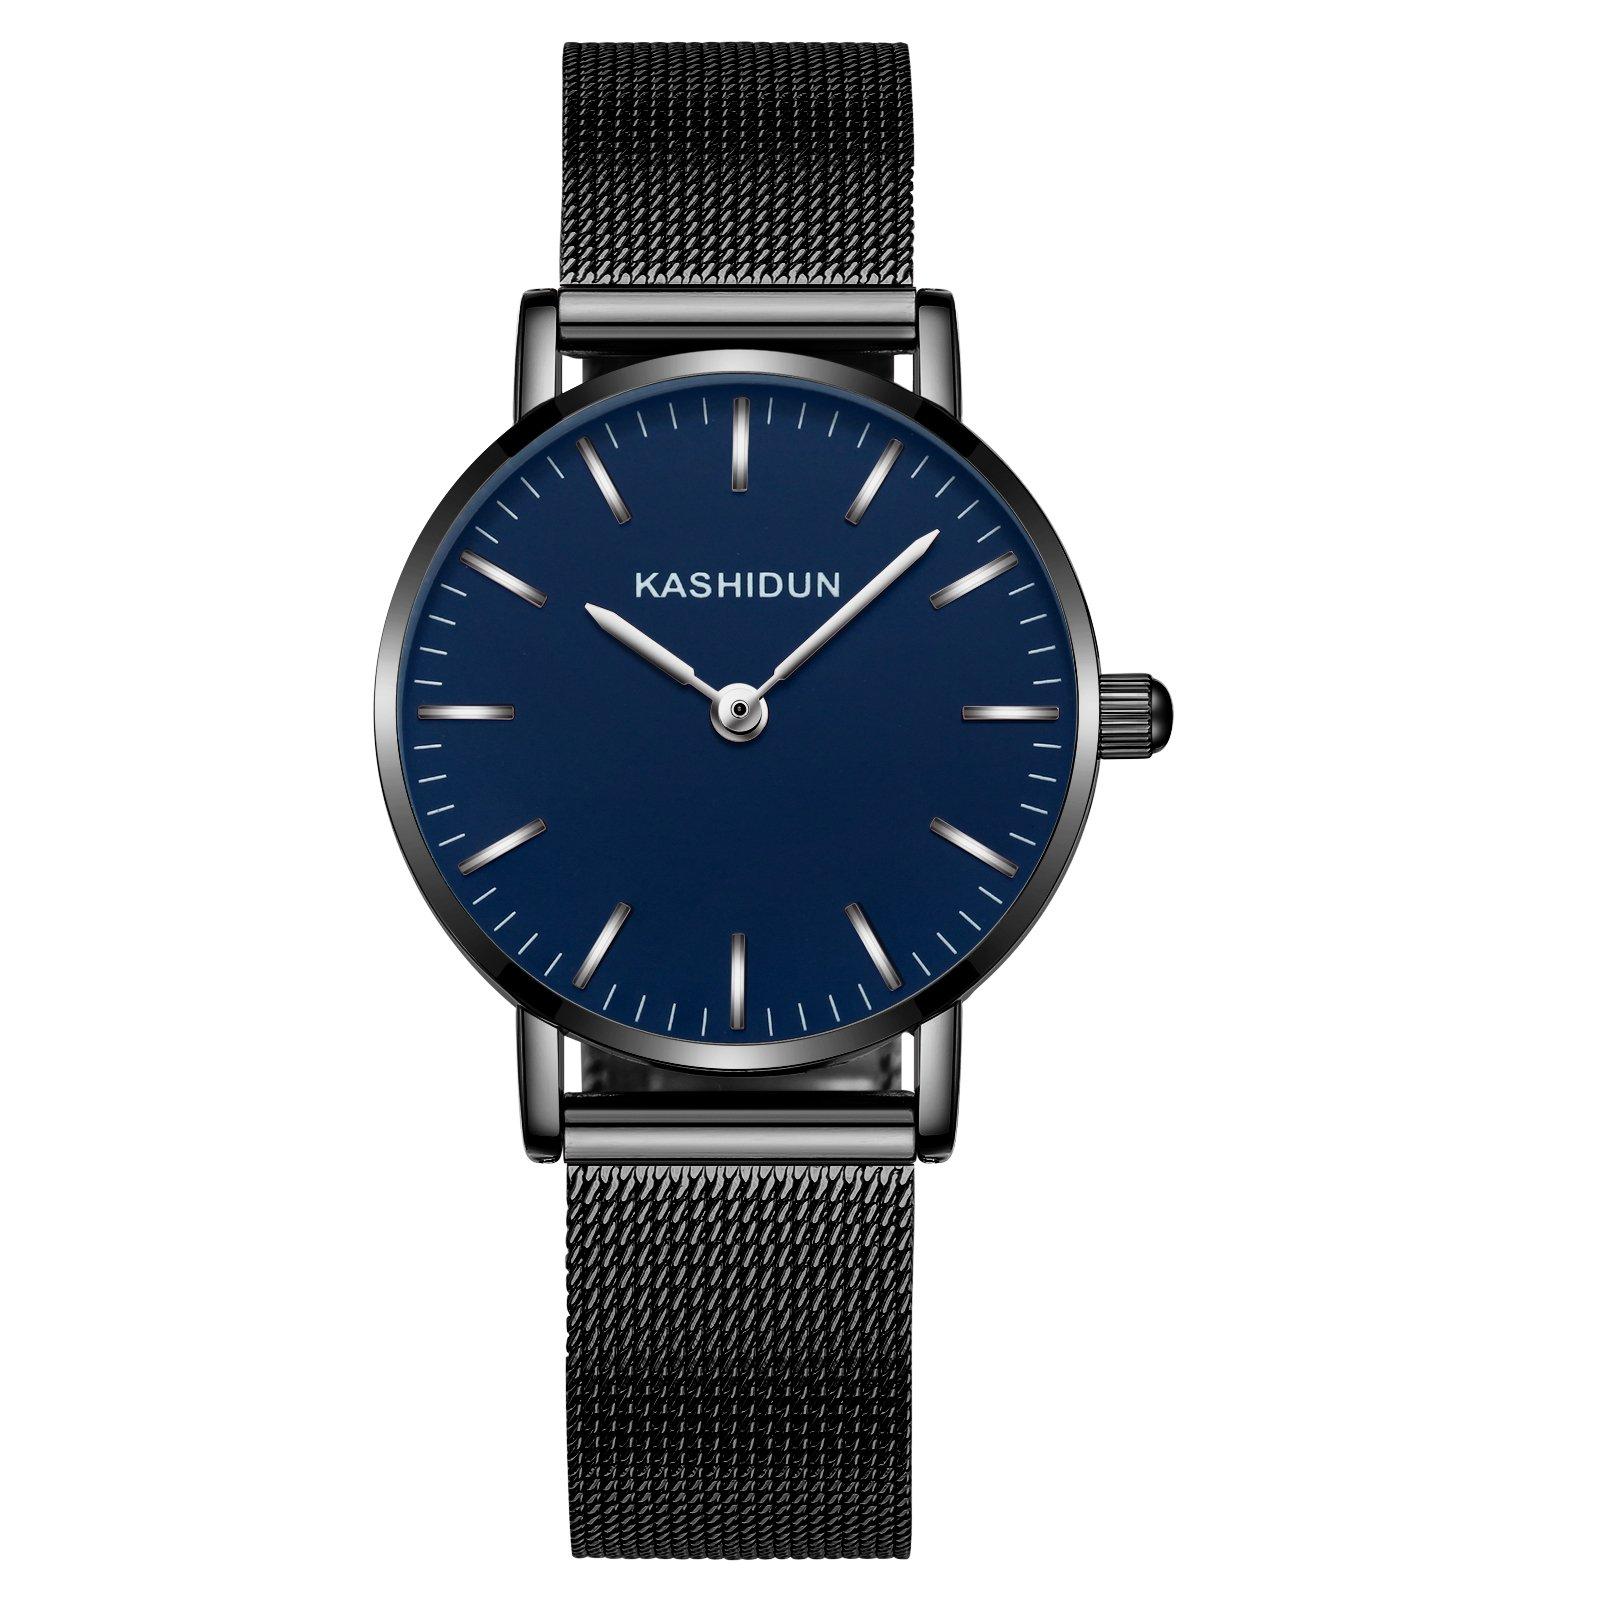 KASHIDUN Women's Watches Gorgeous Waterproof Small Quartz Wristwatches Black Mesh Alloy Bracelet Blue Dial